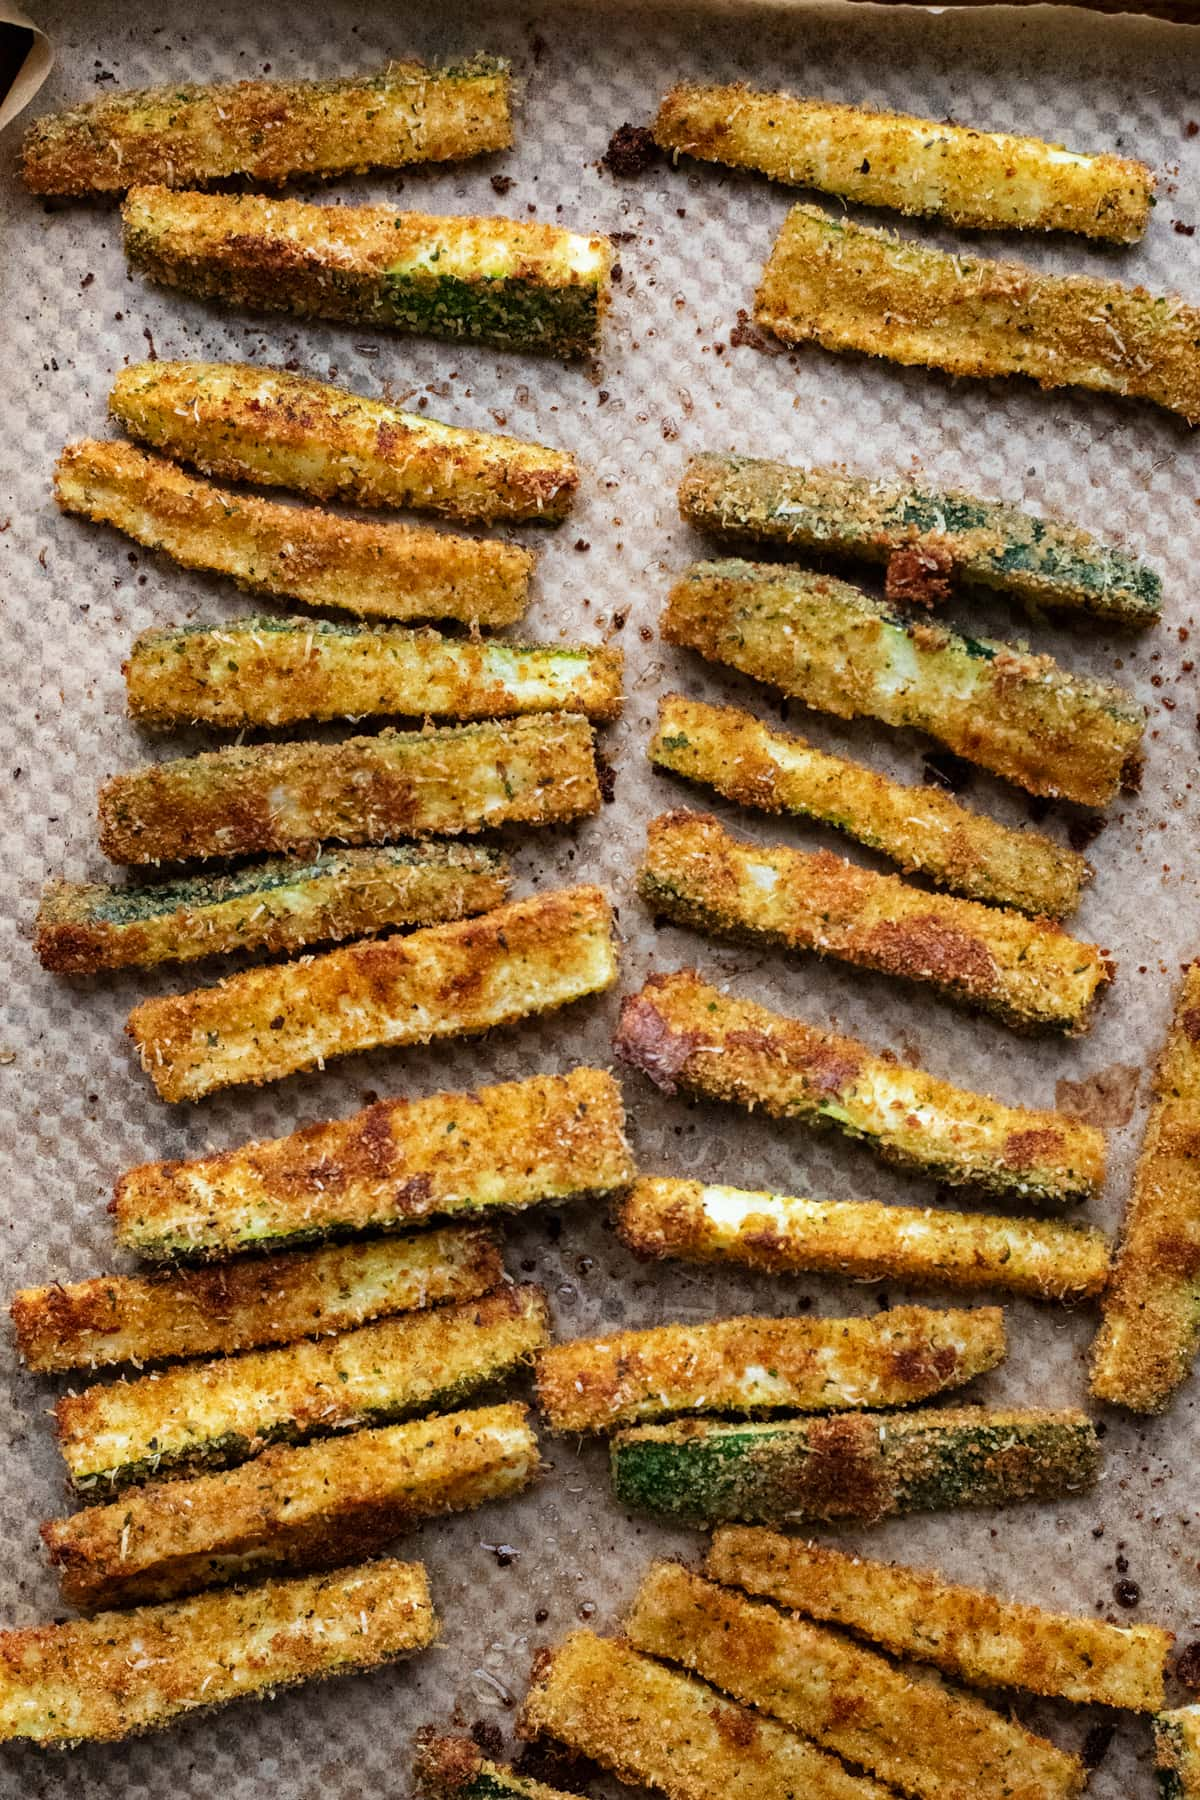 zucchini fries arranged on a sheet pan.